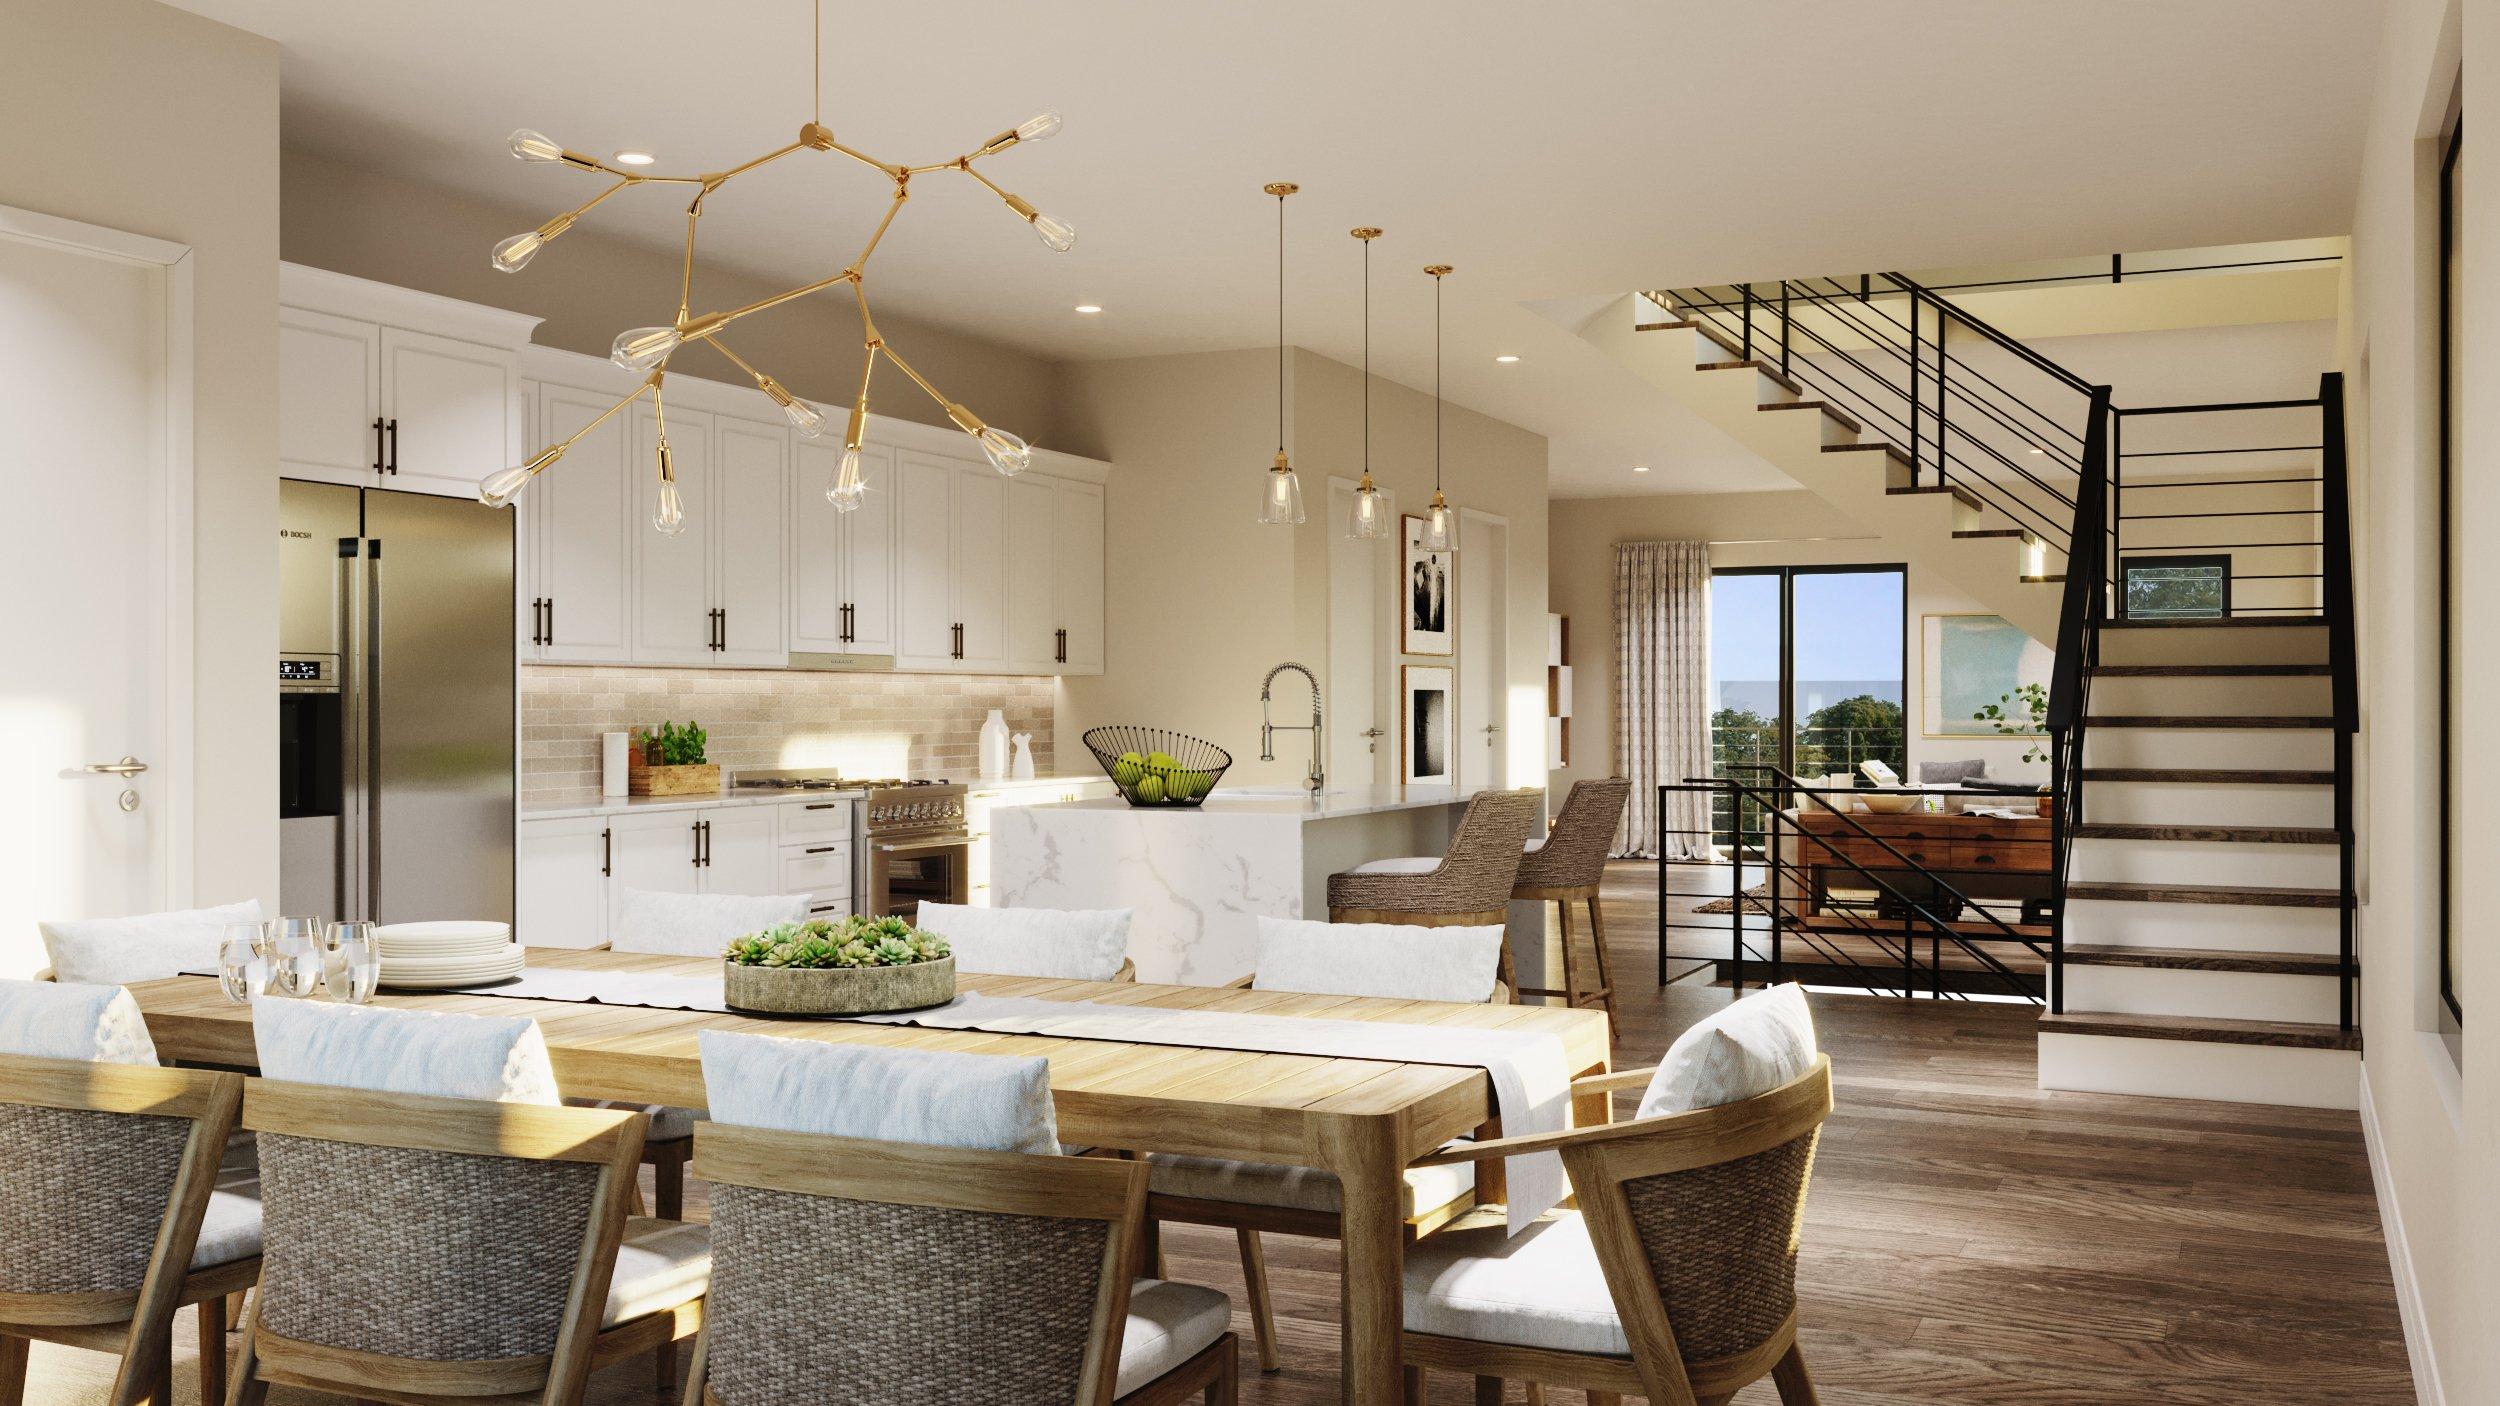 Skyview of Brandon Render - Dining room view